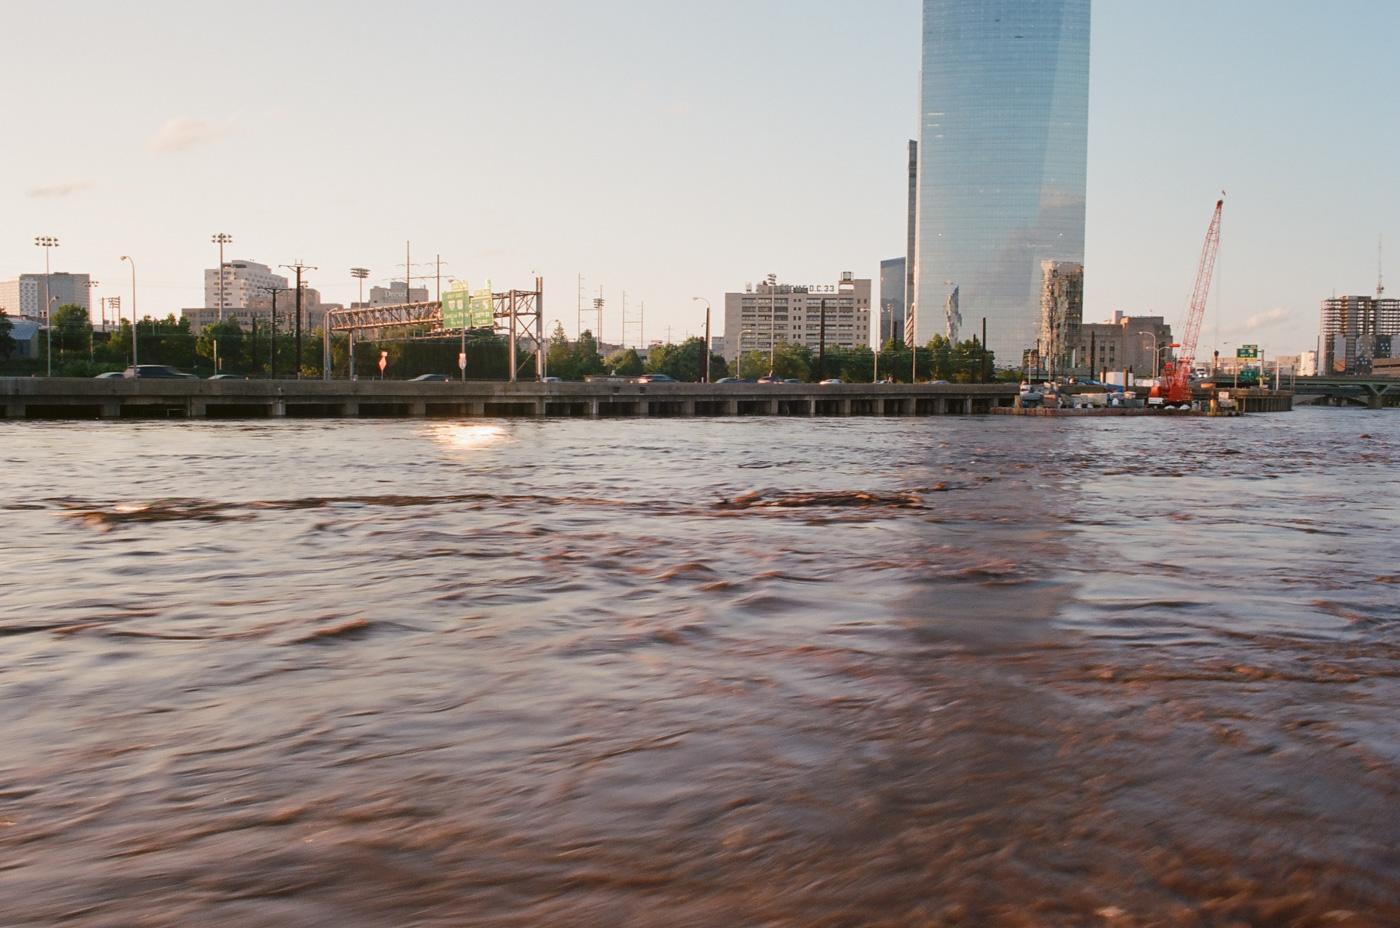 Flooded Schuylkill River